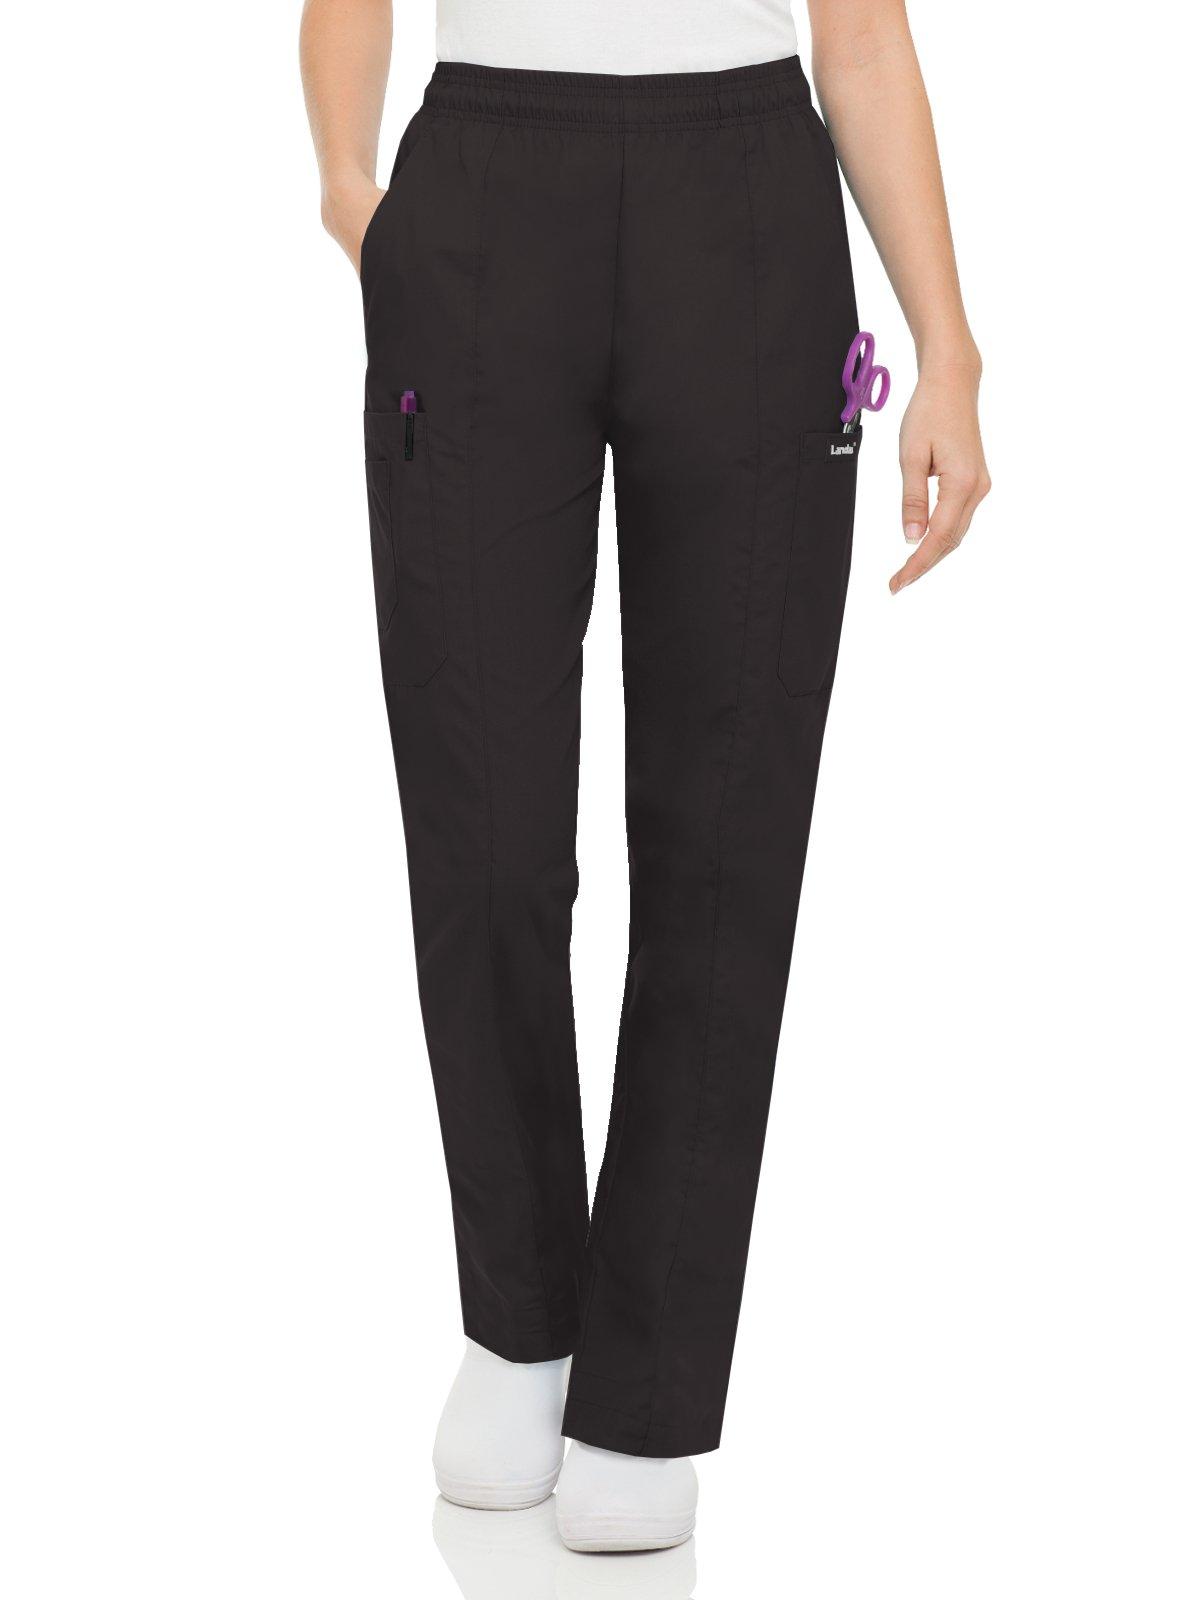 Landau Essentials Women's Classic Fit Elastic-Waist Cargo Scrub Pant Black 2XLP